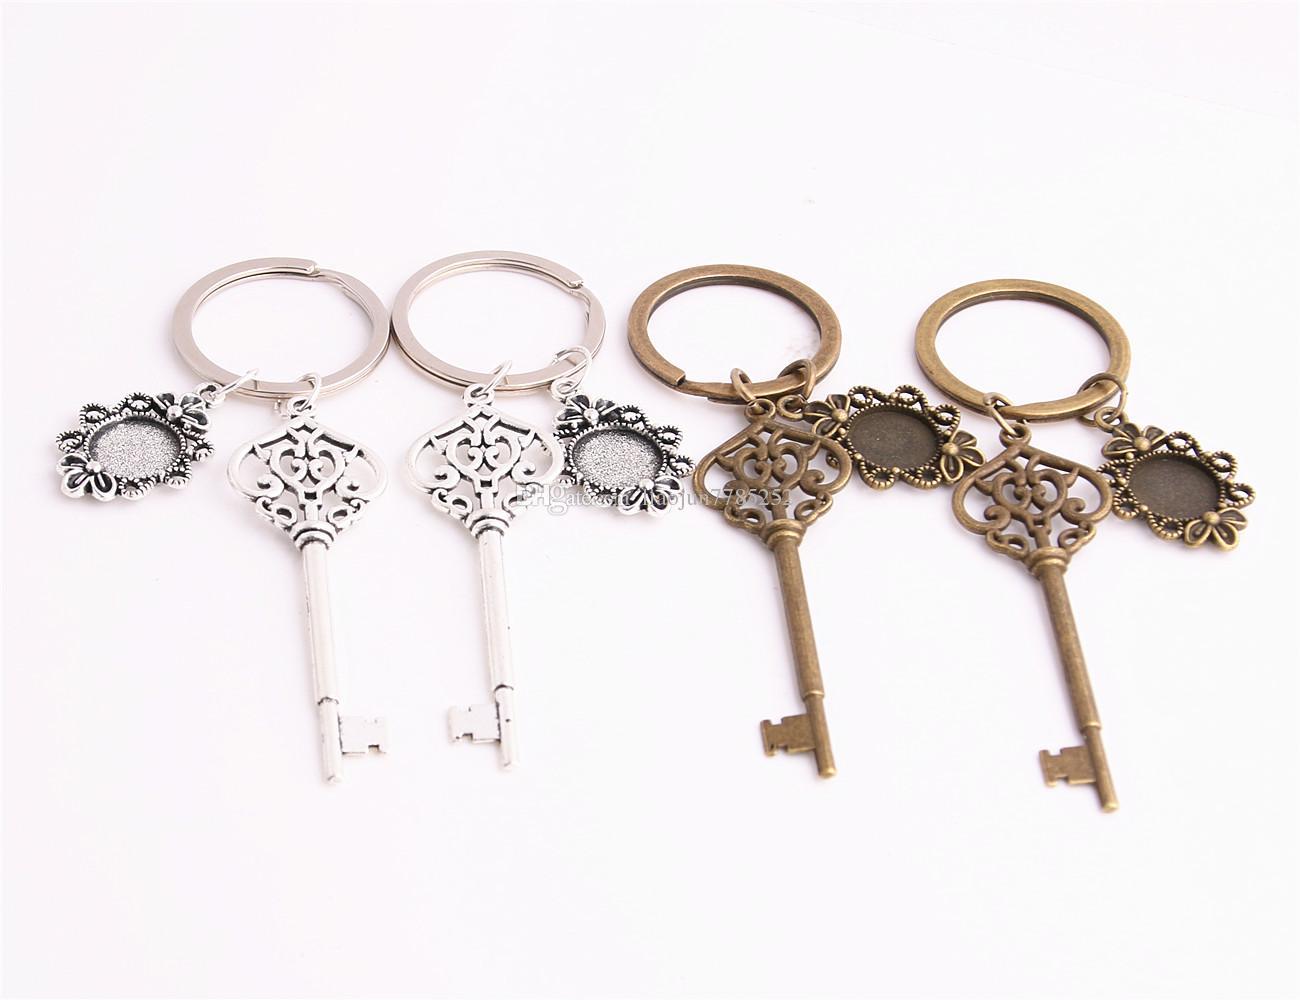 SWEET BELL Metal Alloy Zinc Key Chain Fit Round 12.5mm Cabochon Base Key Charm Pendant Diy Jewelry Making C0894